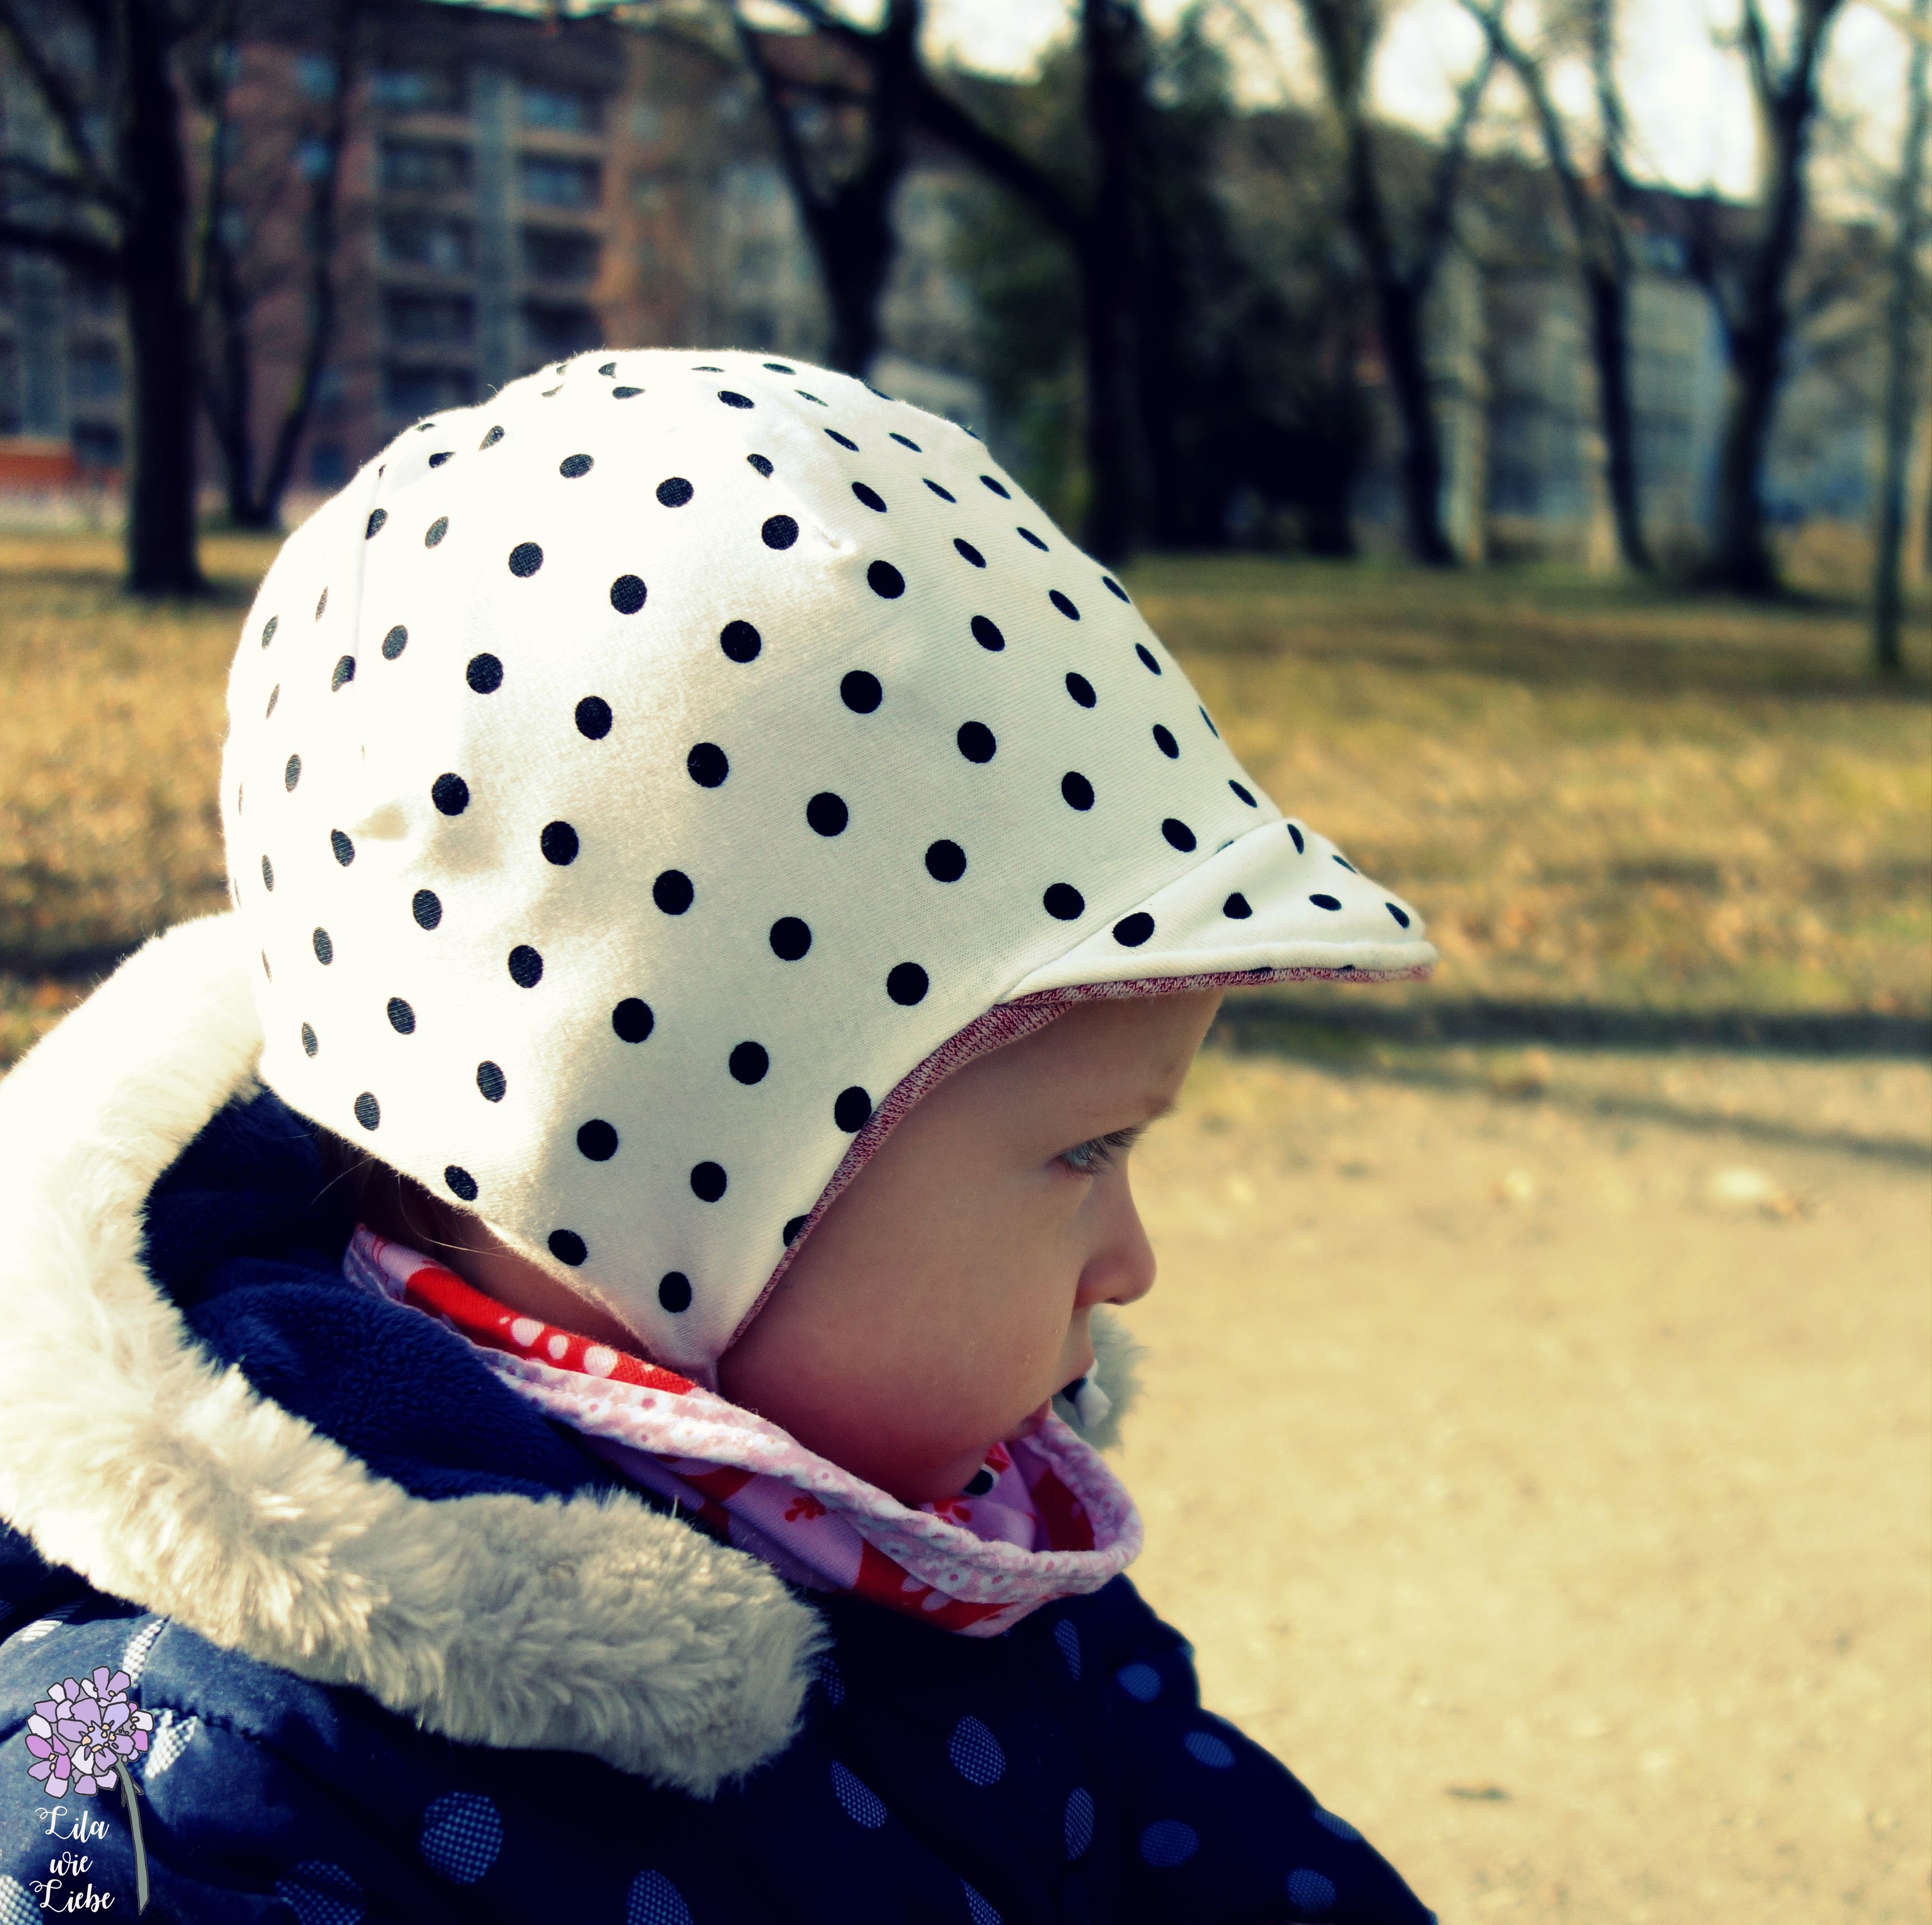 Supermüzz für den Frühling – Frühlingsmütze für Kinder selbst nähen – Lila wie Liebe